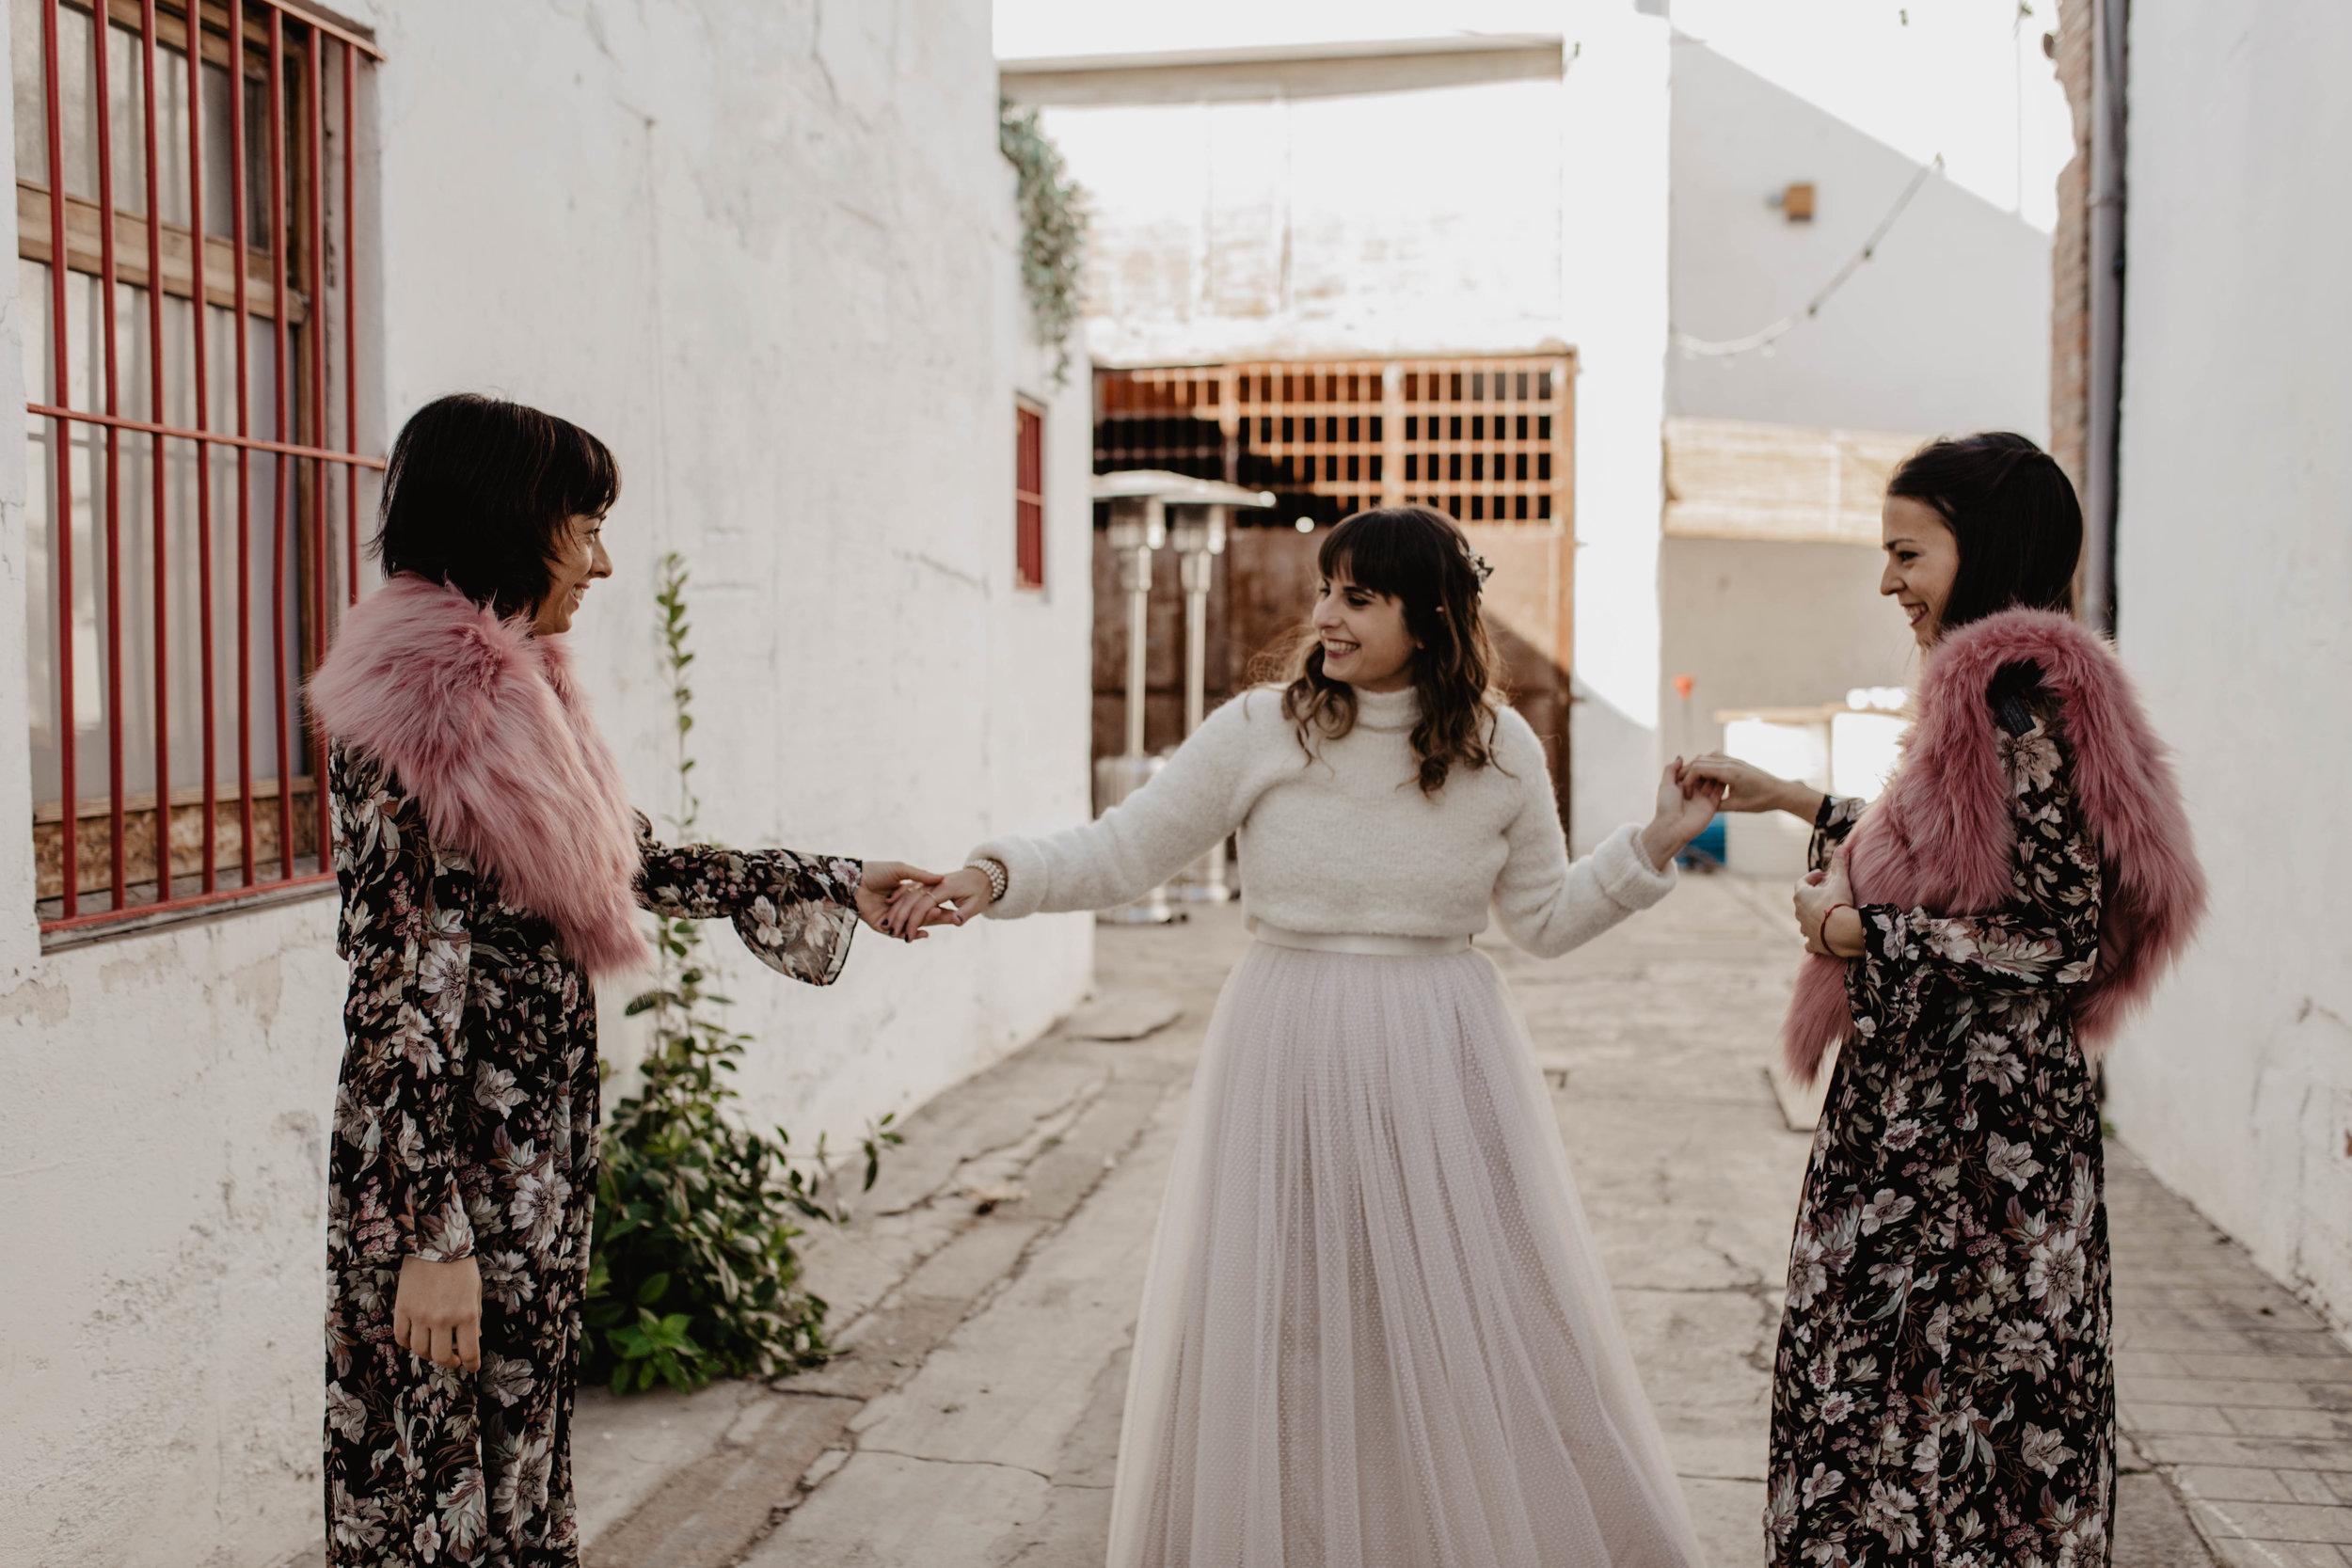 thenortherngirlphotography-photography-weddingphotography-couple-bodasconestilo-bodasenbarcelona-martadavid-213.jpg